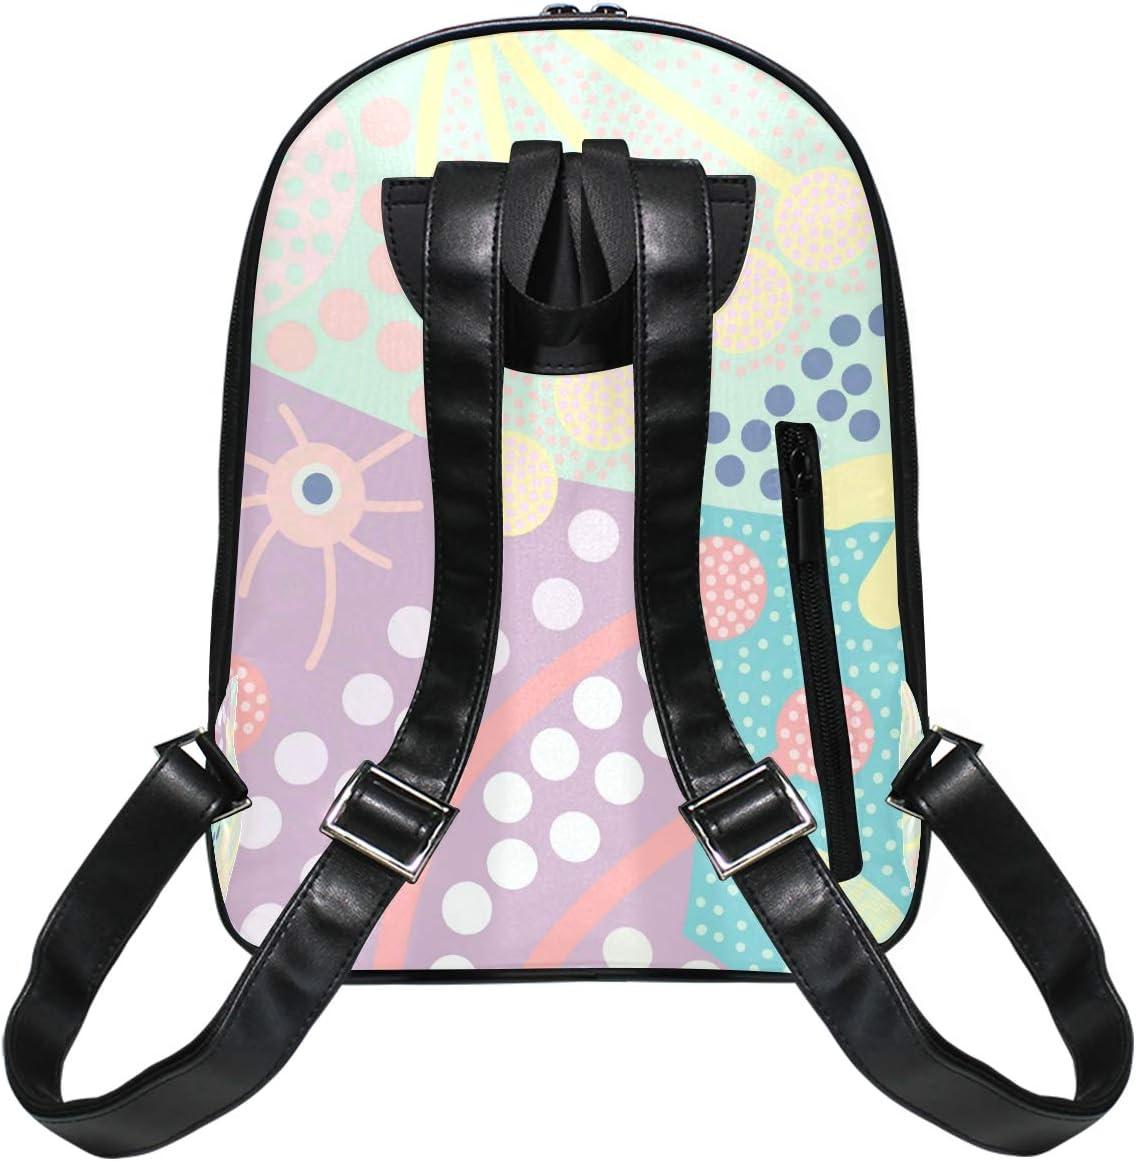 Bright Cute Doodle Pattern Cartoon Girls Backpacks for Elementary School Bookbag Boys 3rd 4th 5th Grade